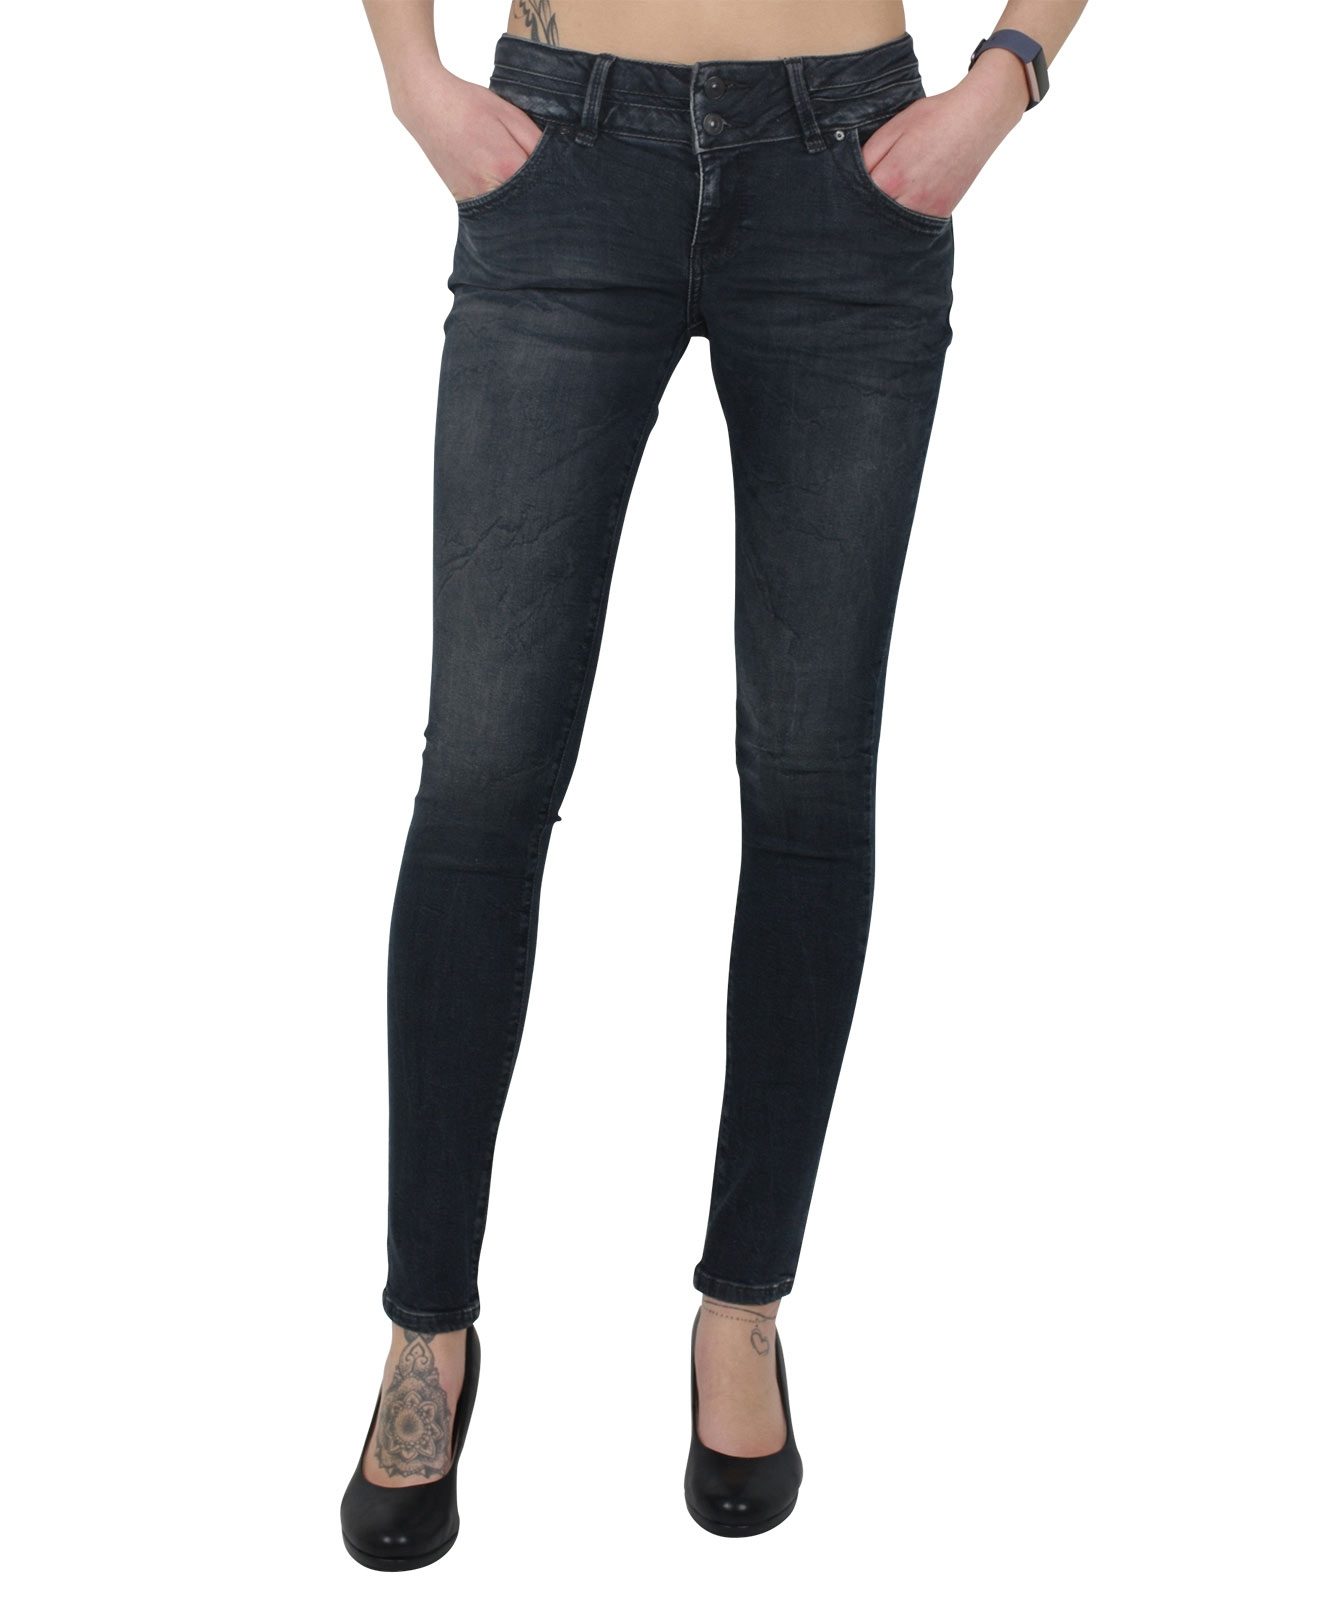 Hosen - LTB Skinny Jeans Julita X in Oisa  - Onlineshop Jeans Meile